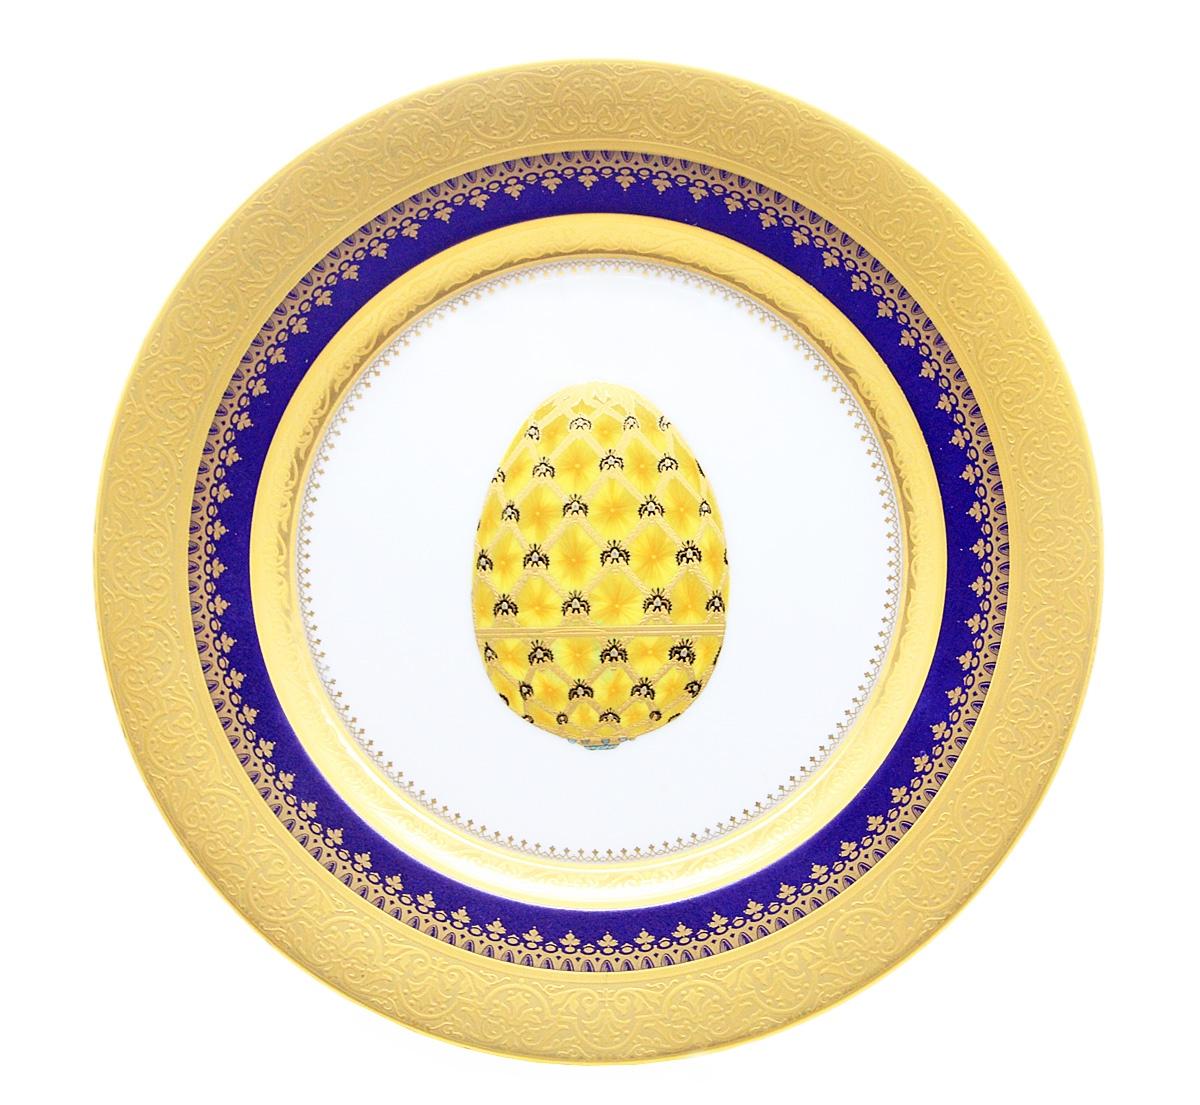 Тарелка Коронация. Фарфор, золочение. Ручная роспись. Faberge, Франция, конец ХХ века faberge